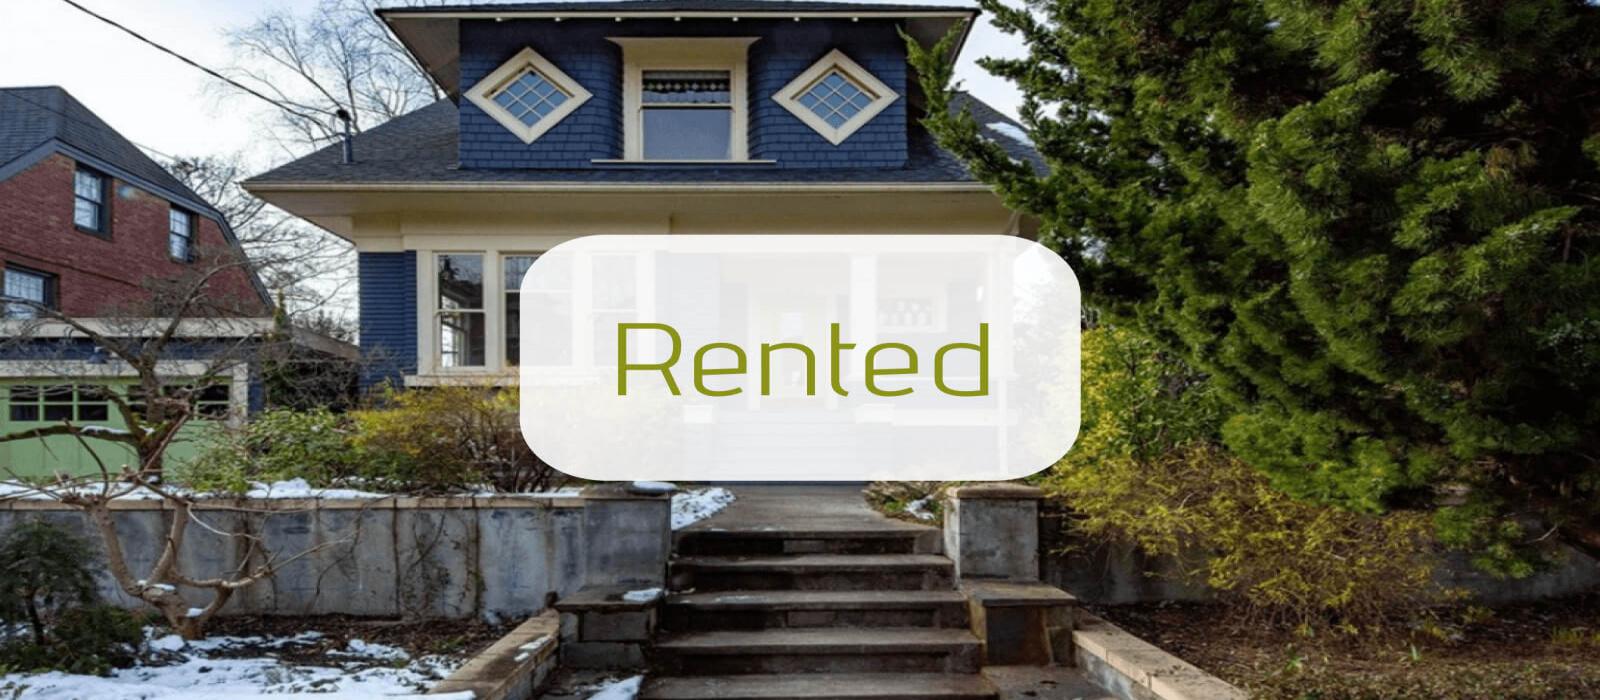 1819 Nob Hill Ave N, Seattle, Washington 98109, 3 Bedrooms Bedrooms, ,1.75 BathroomsBathrooms,Farm,For Rent,Nob Hill Ave N,1036